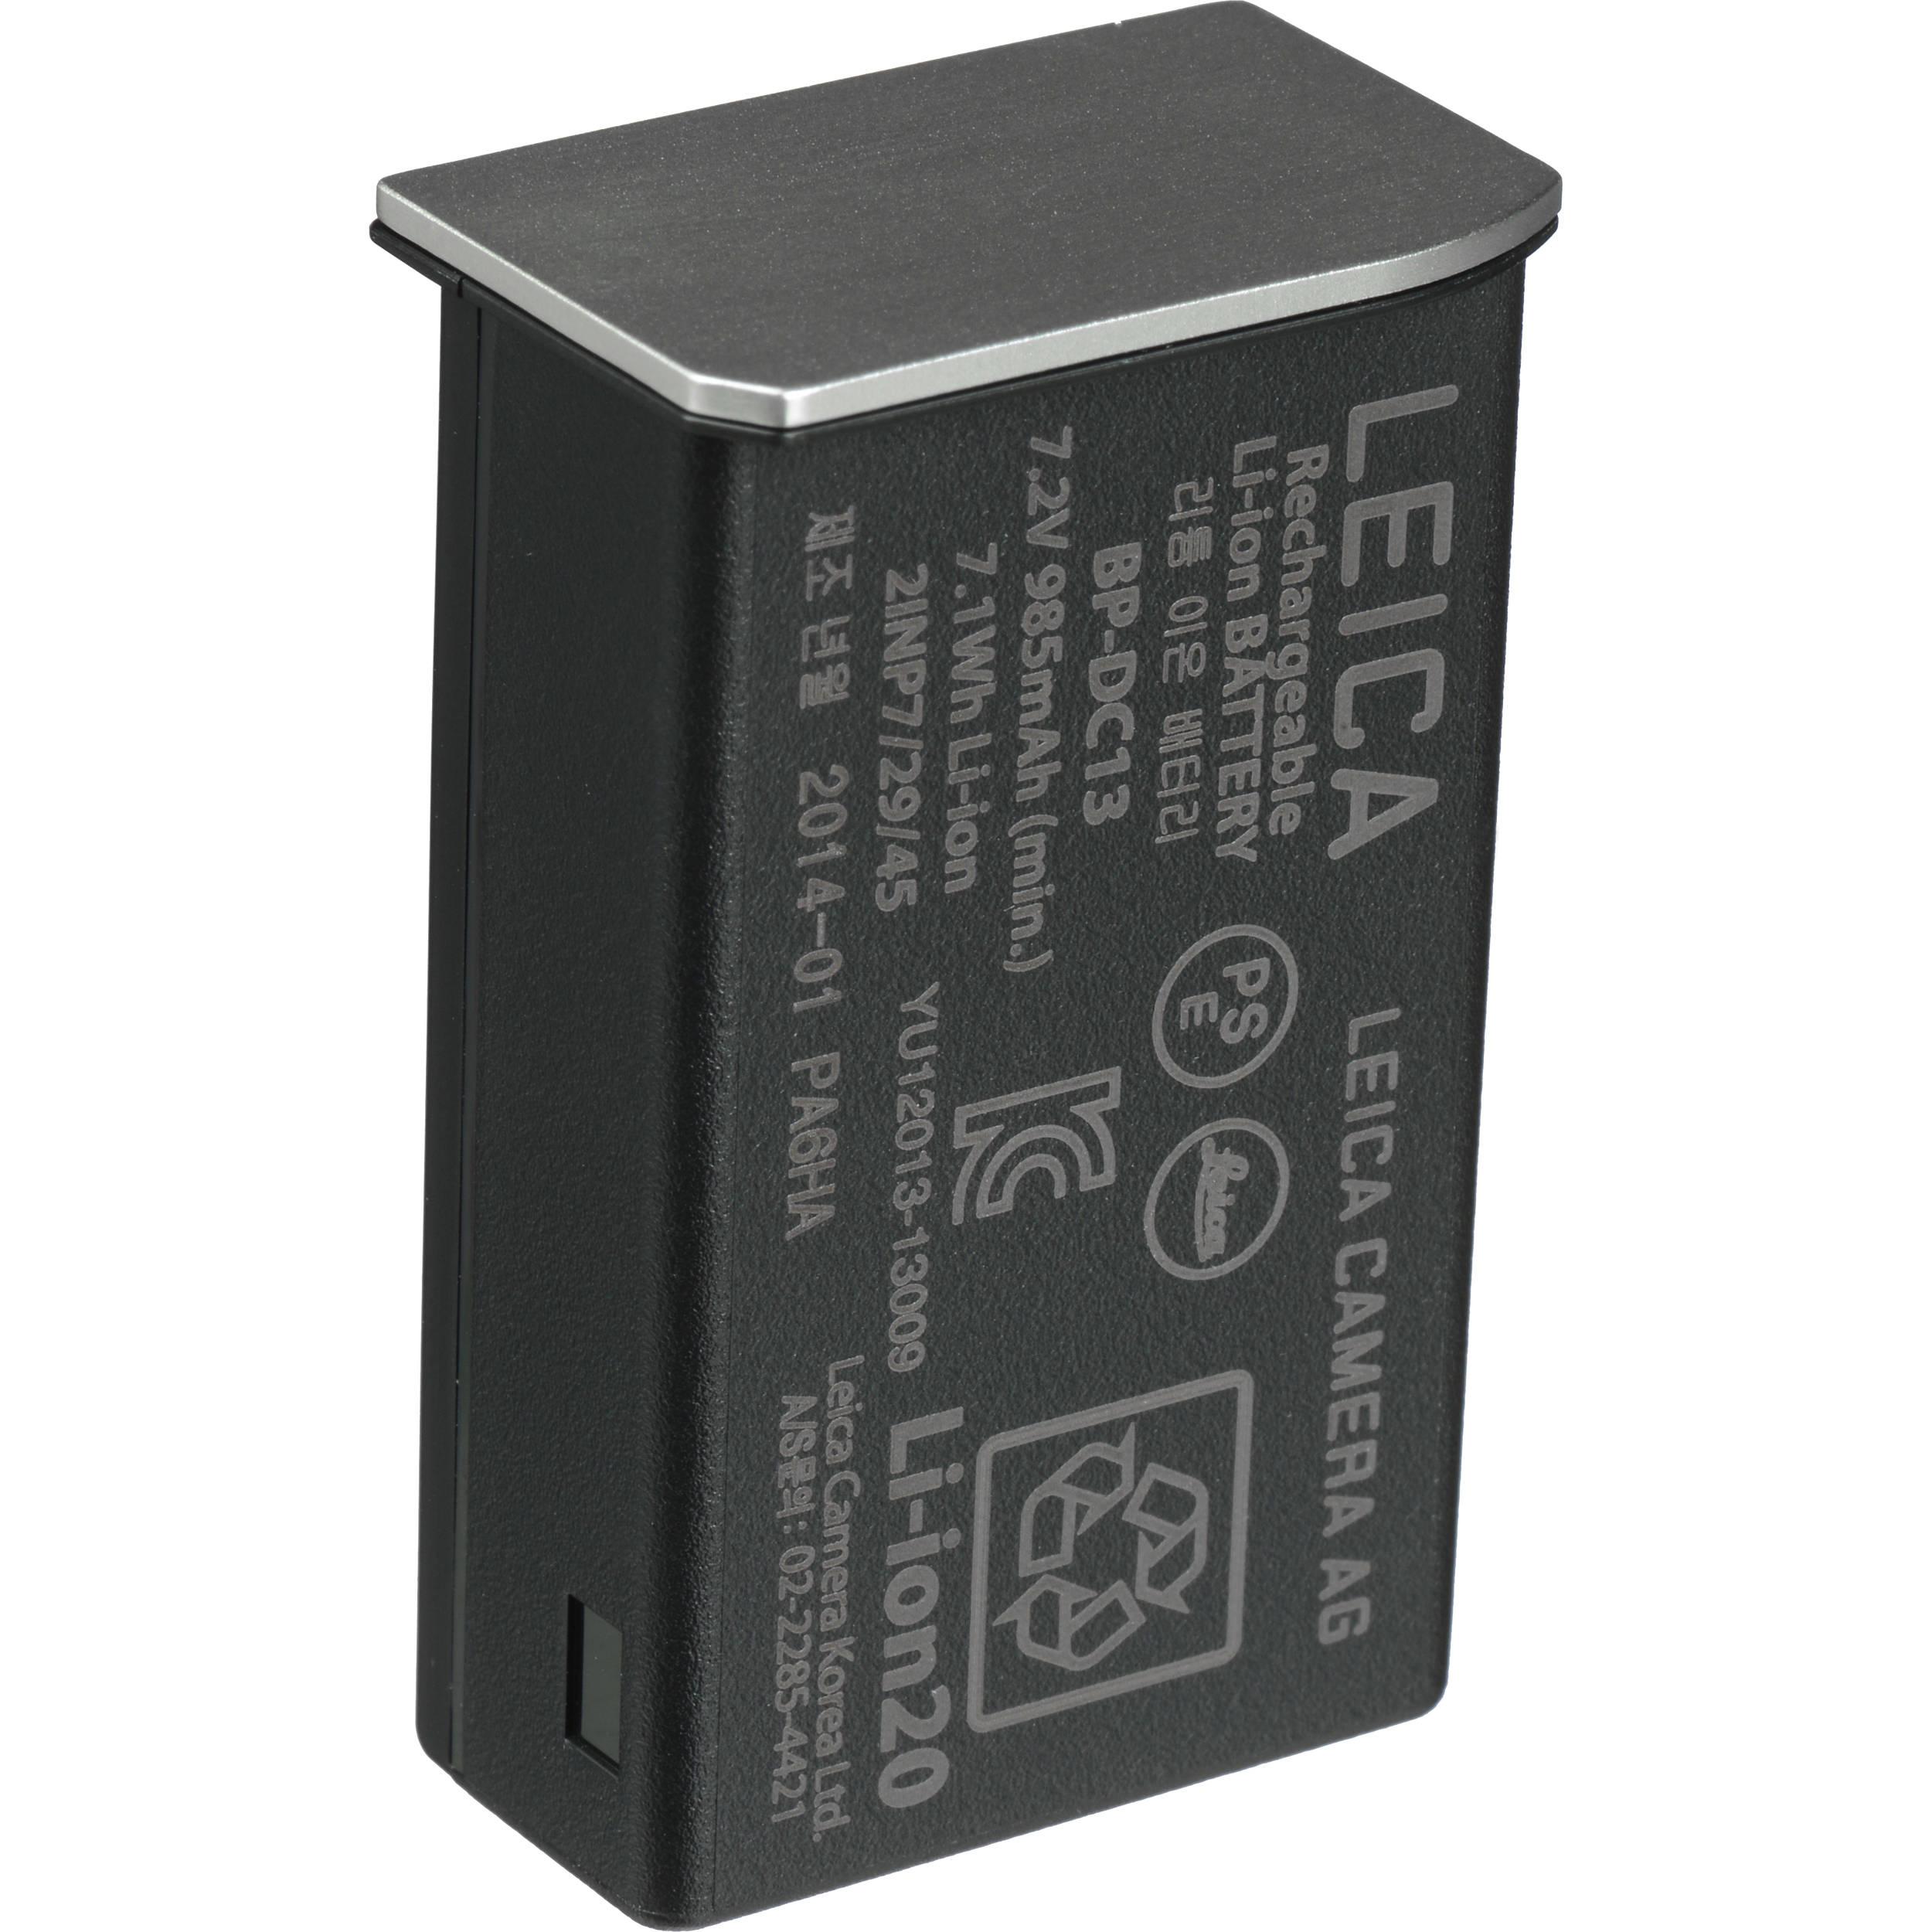 2Wh E Li-Ion BP-DC 3 7,2V 1700mAh//12 Batería para Leica tipo//ref